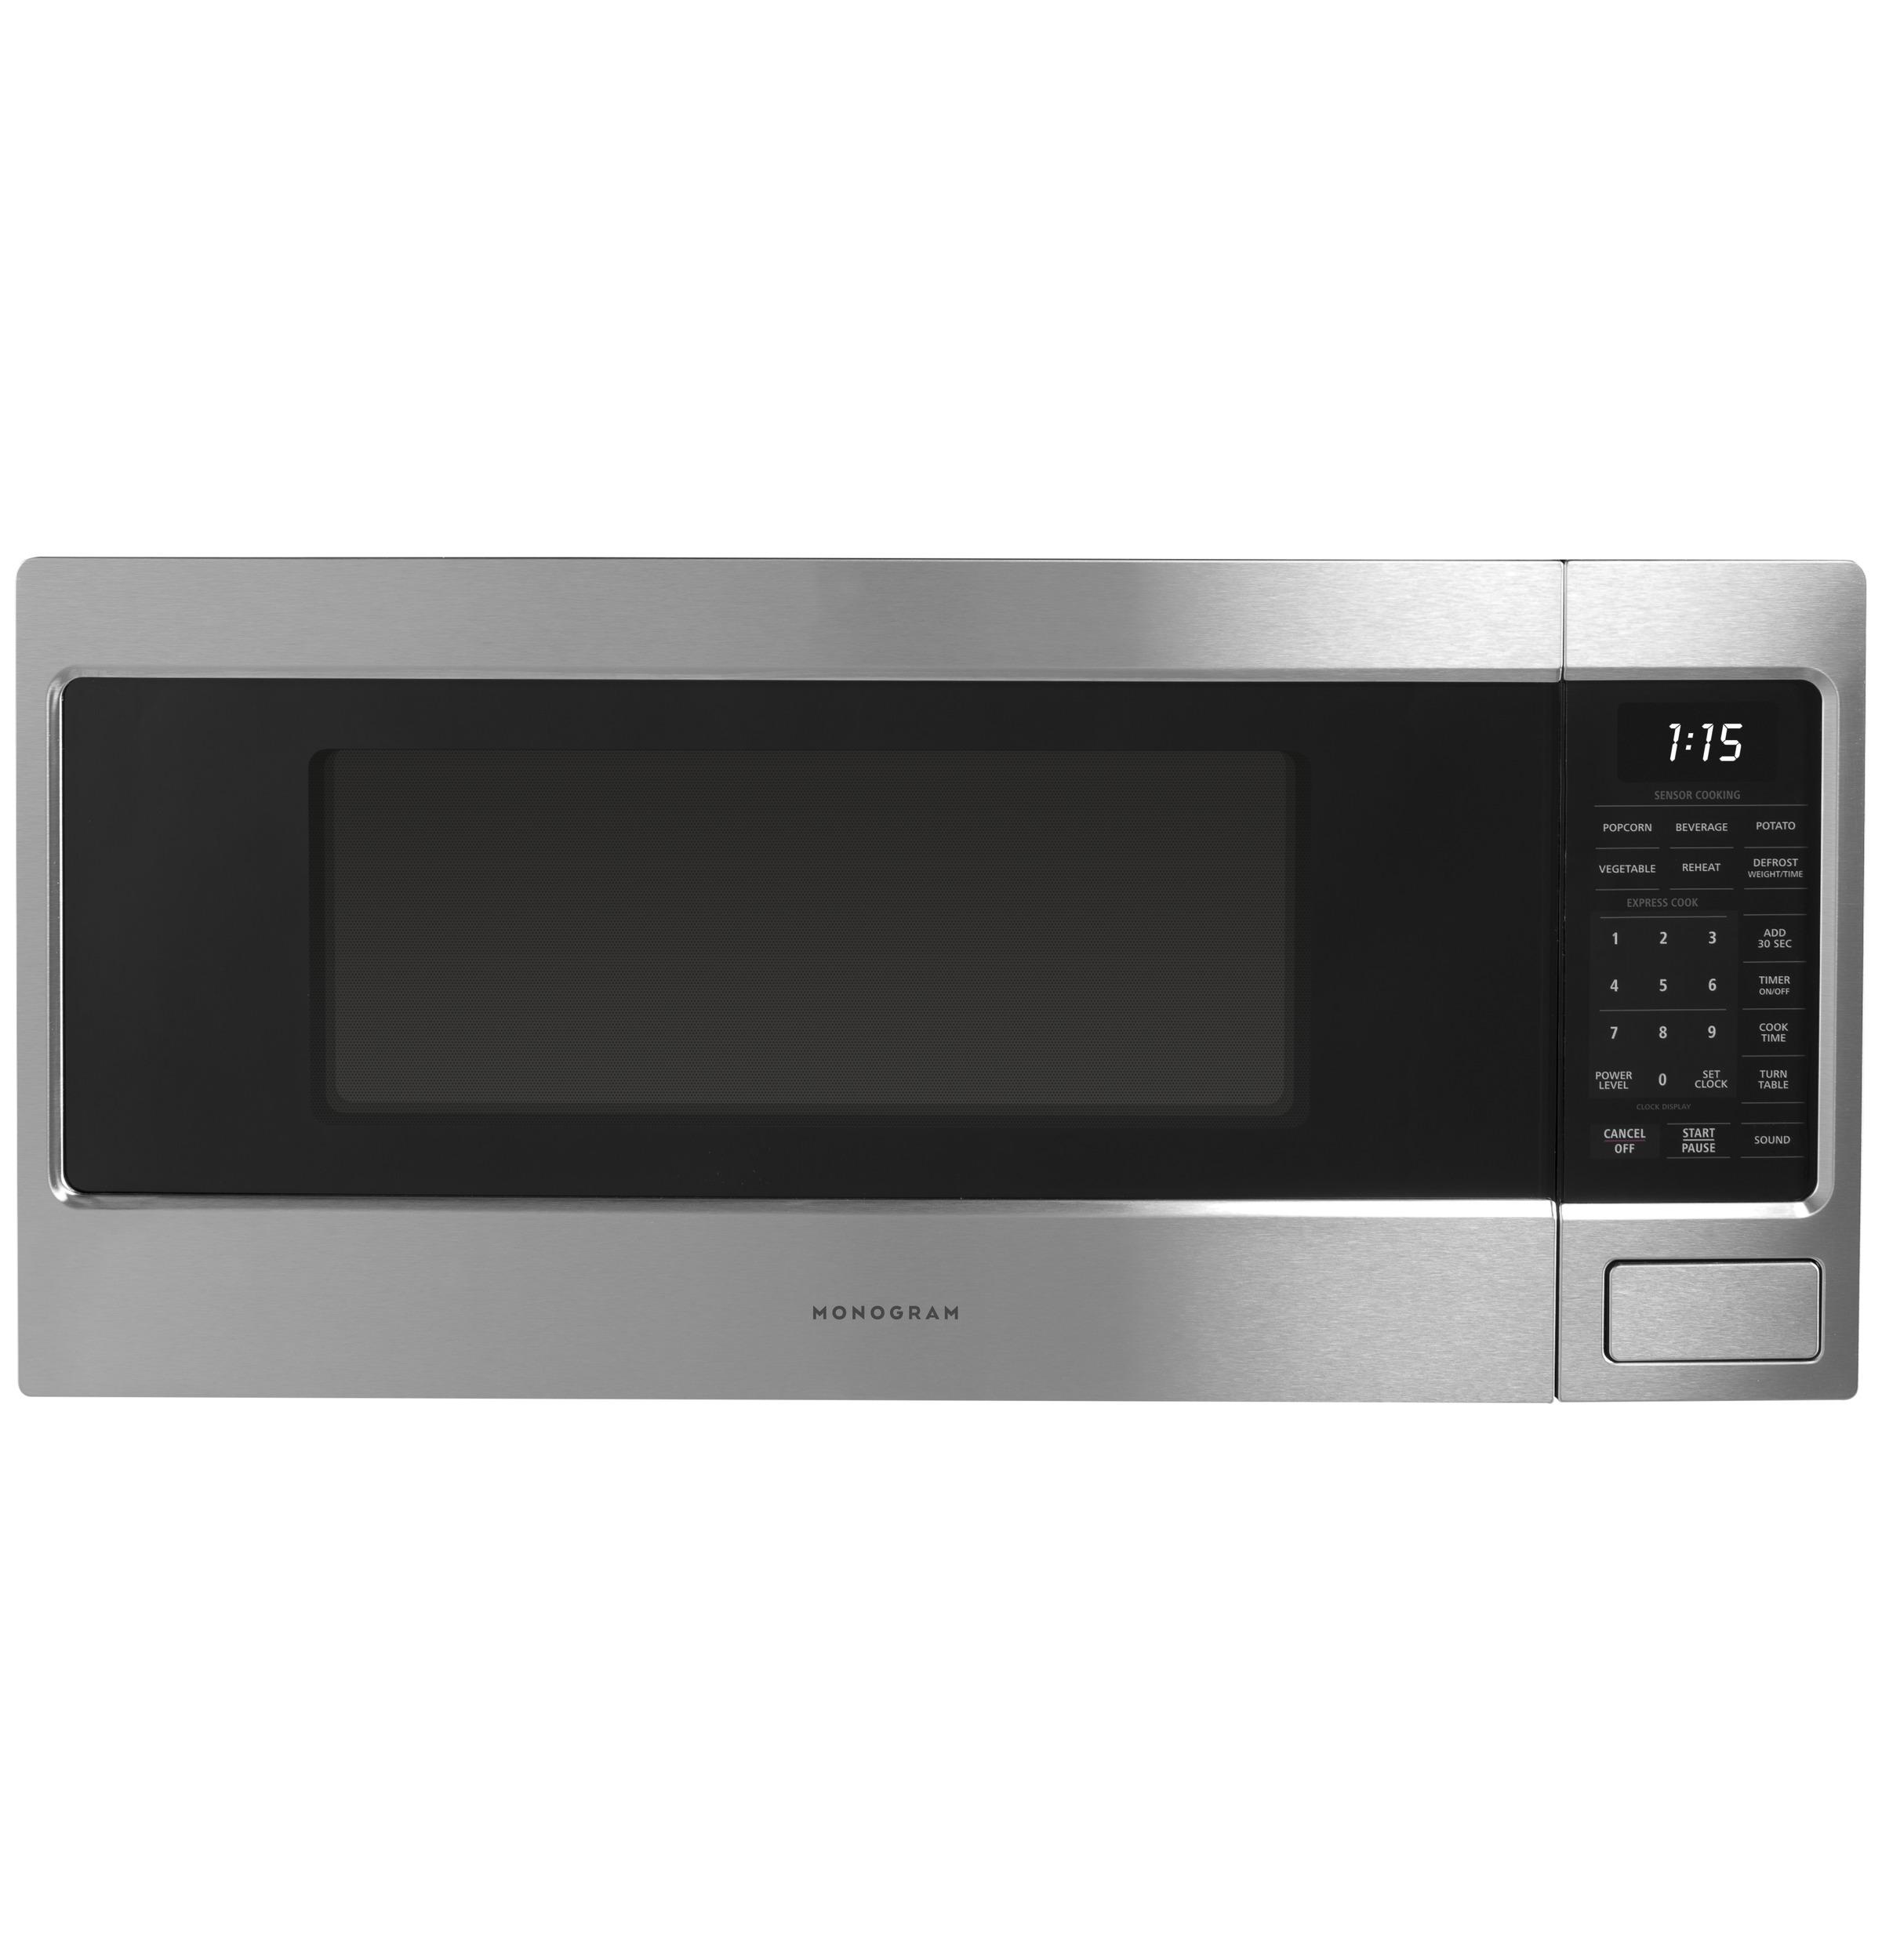 Monogram Monogram 1.1 Cu. Ft. Countertop Microwave Oven